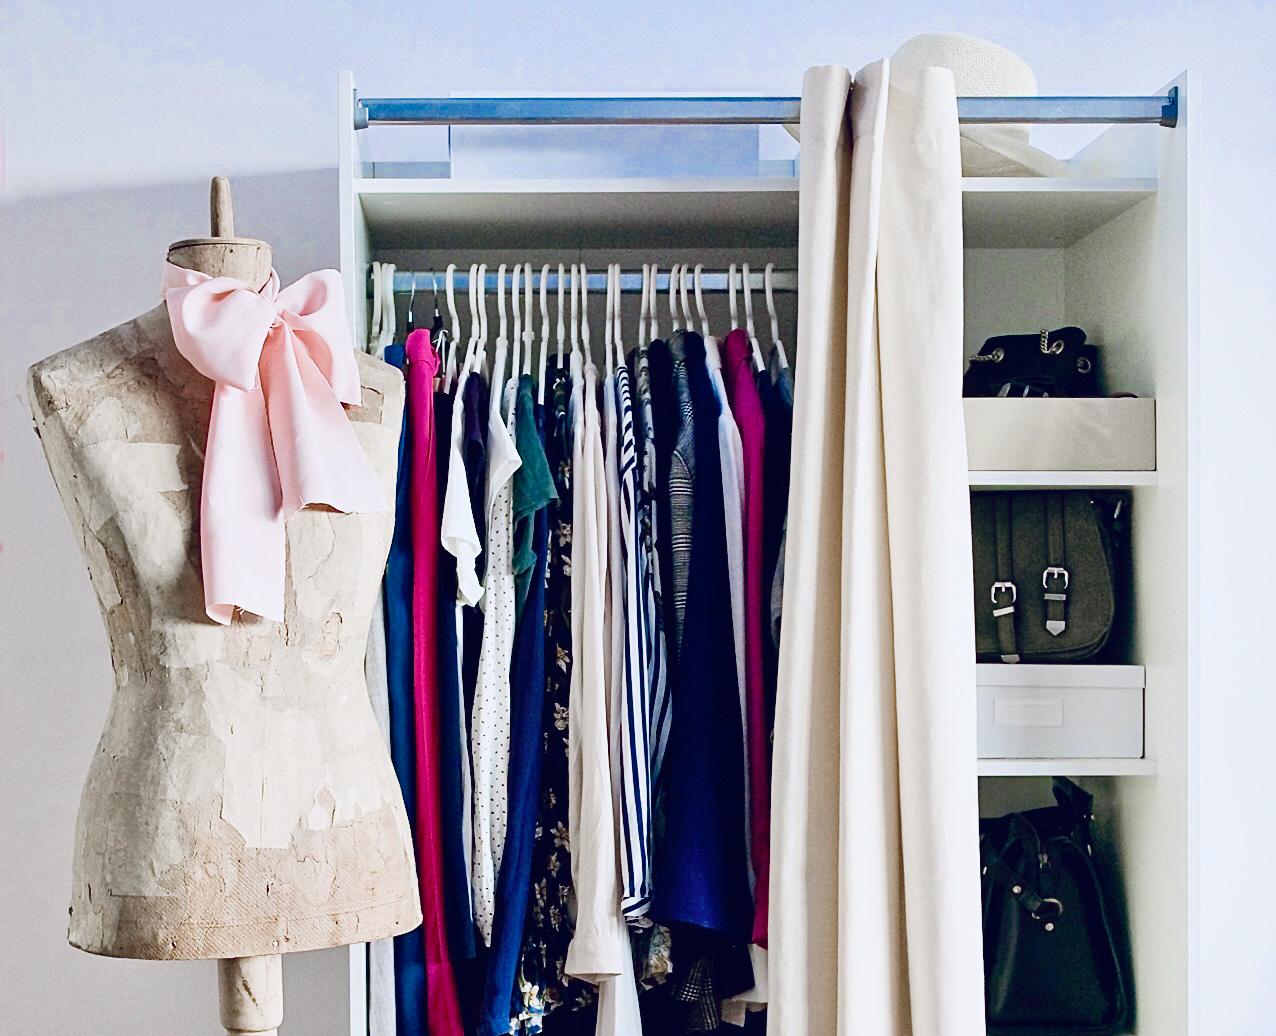 minimalismo nell'armadio